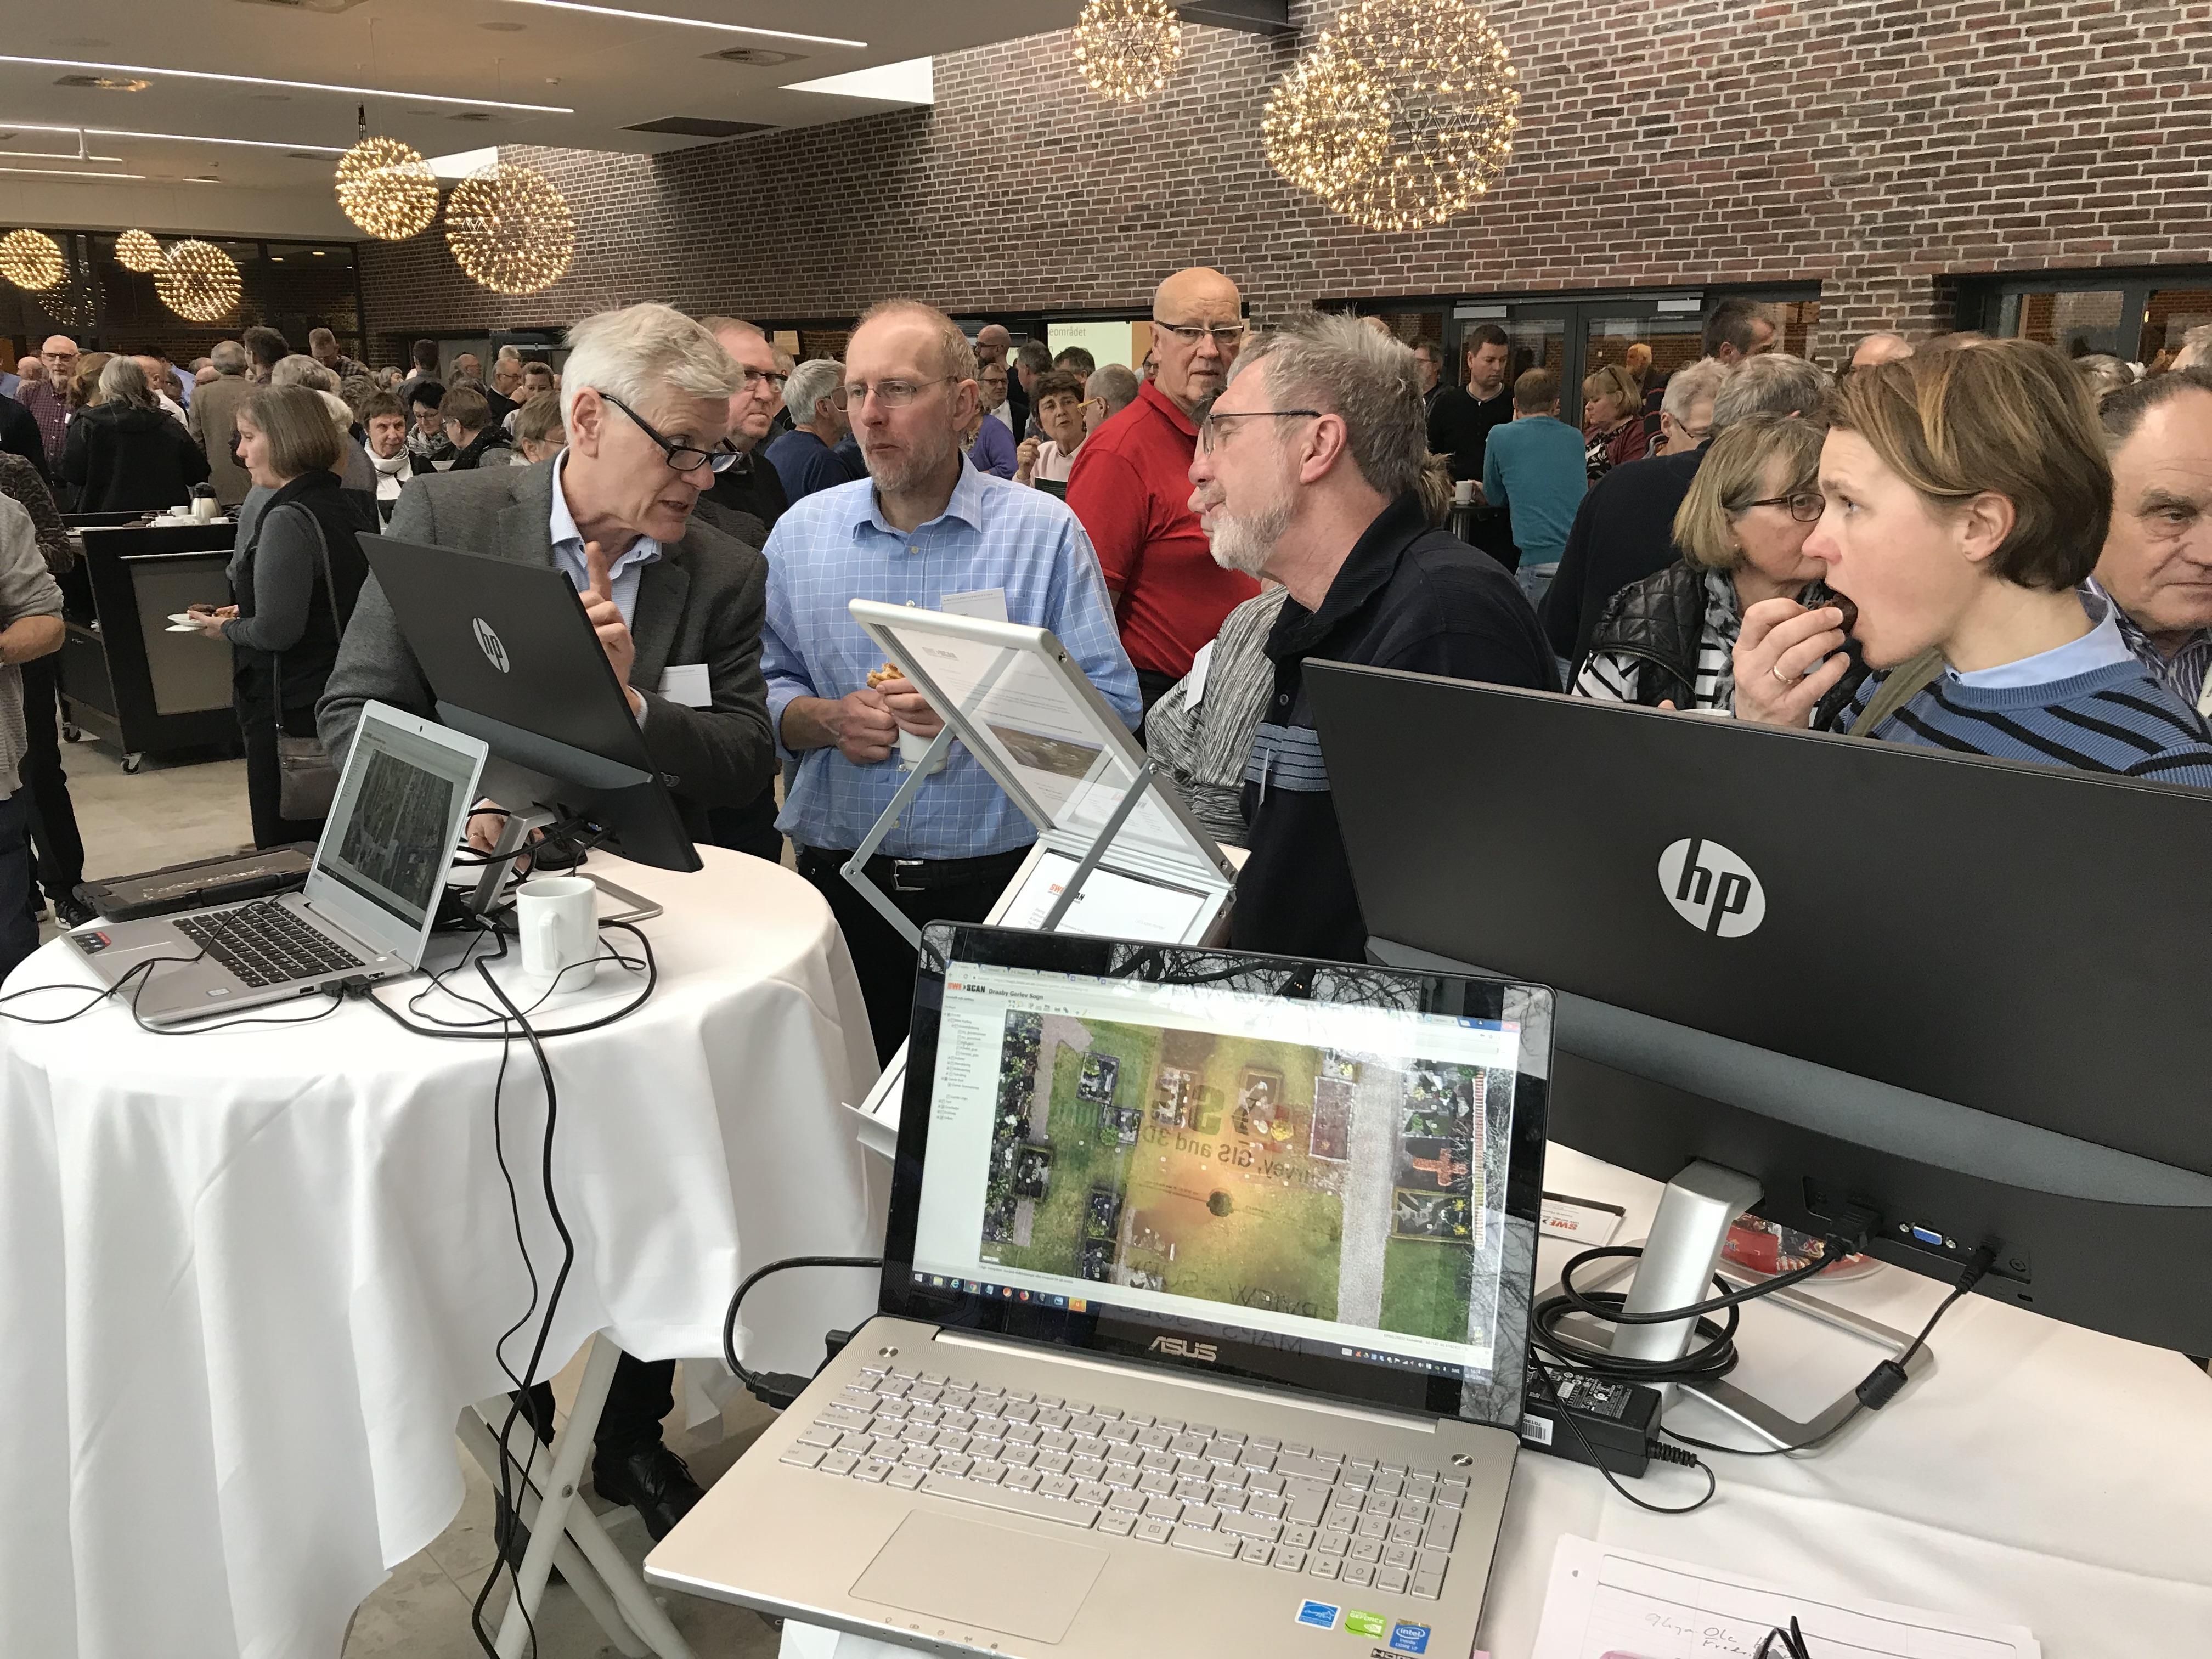 Kirkegårdskonferencen 2018, Nyborg strand, Fyn, Danmark